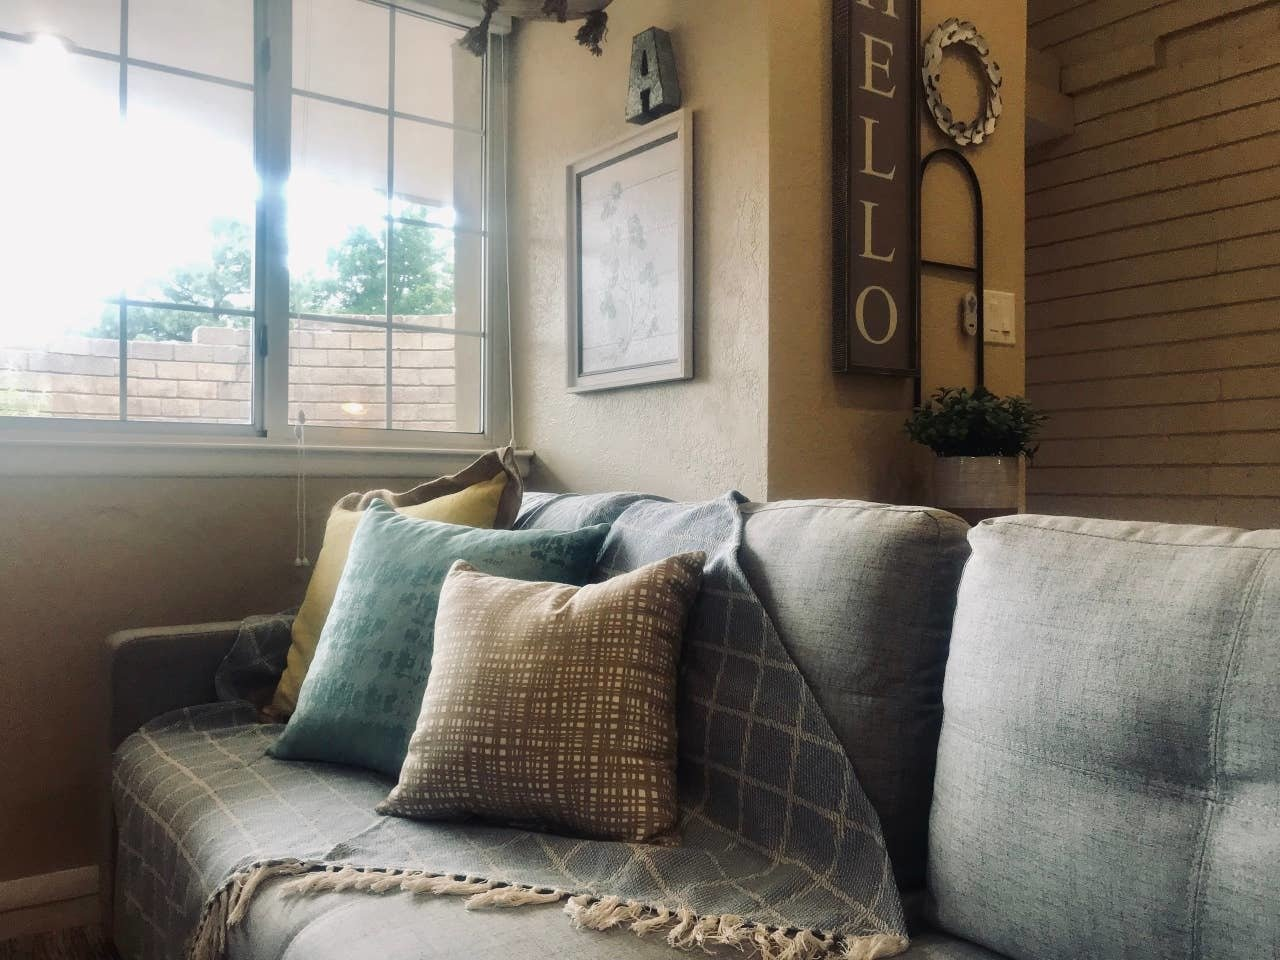 Living Room, Sectional, and Ceramic Tile Floor  Nakomis Dwellings